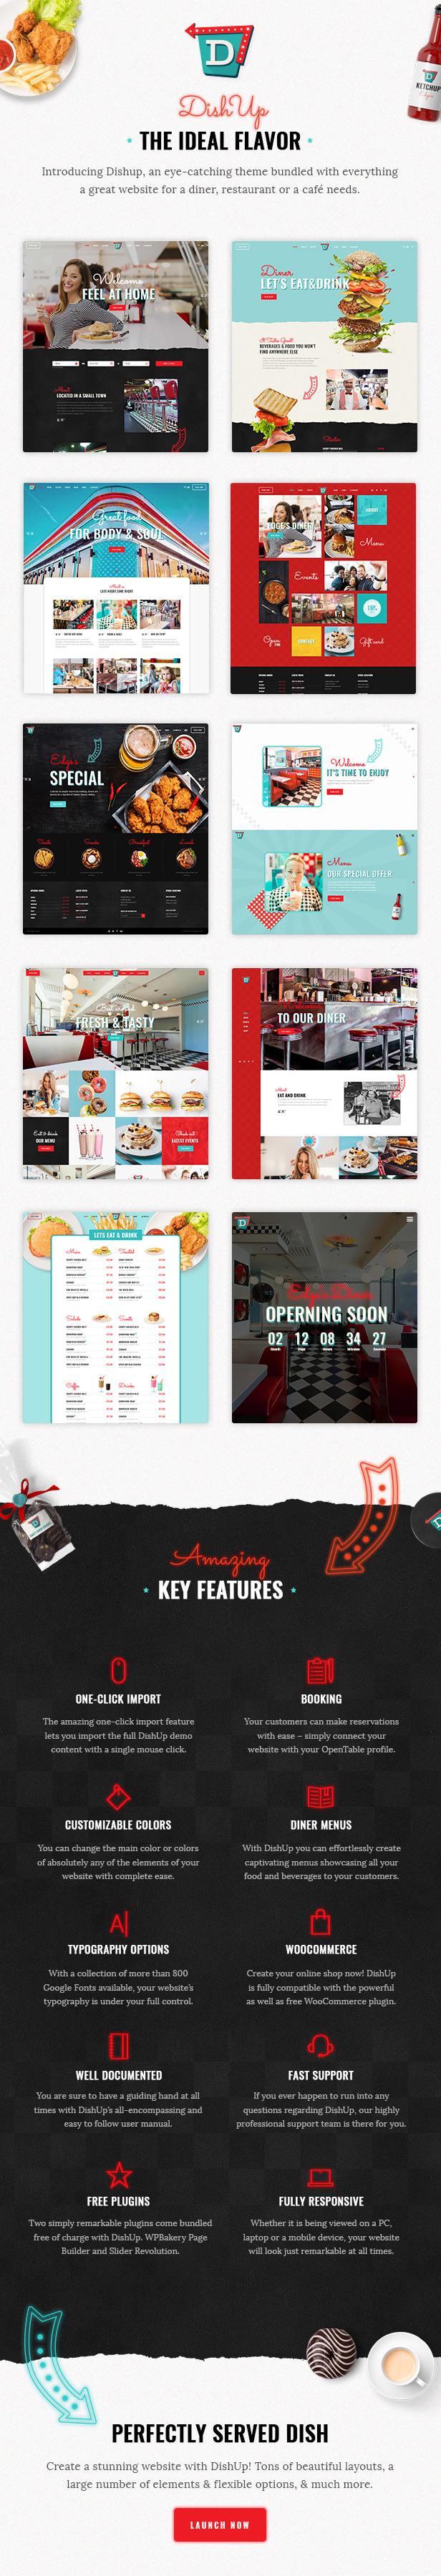 DishUp - Restaurant Theme - 1